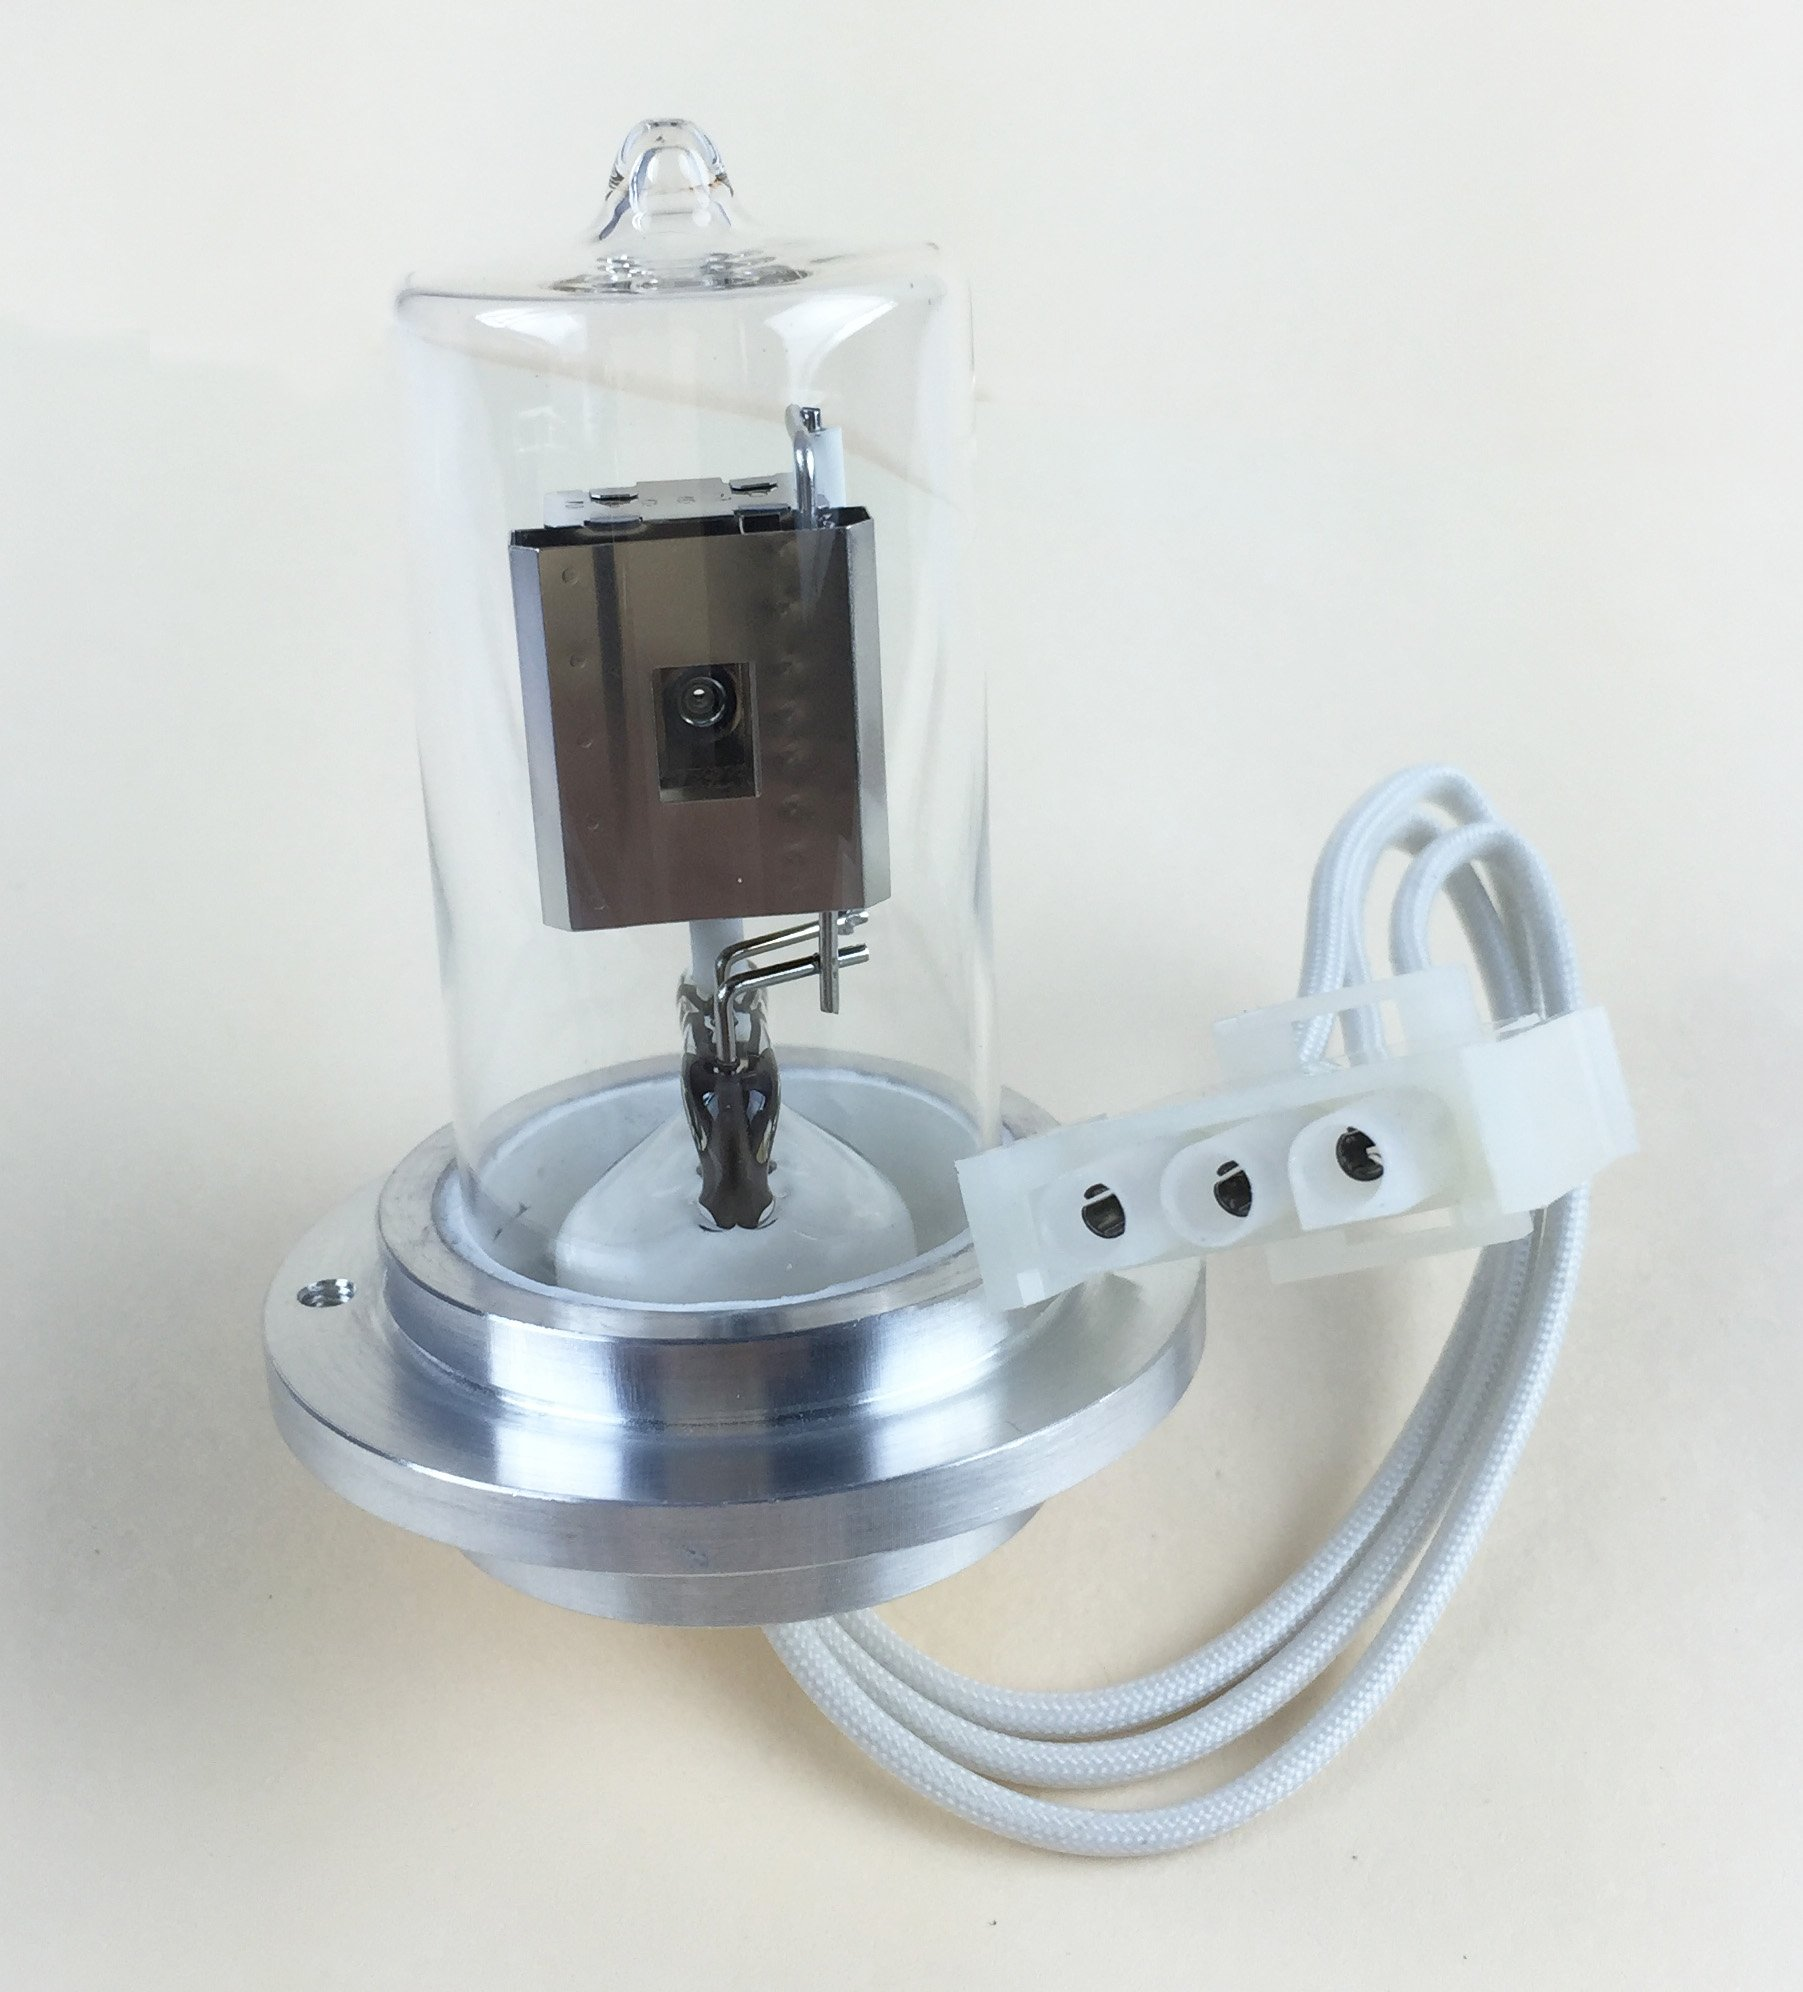 Azzota Deuterium Lamp for Agilent 1100 and 1200 HPLC detector DAD - 1000 hours Guarantee